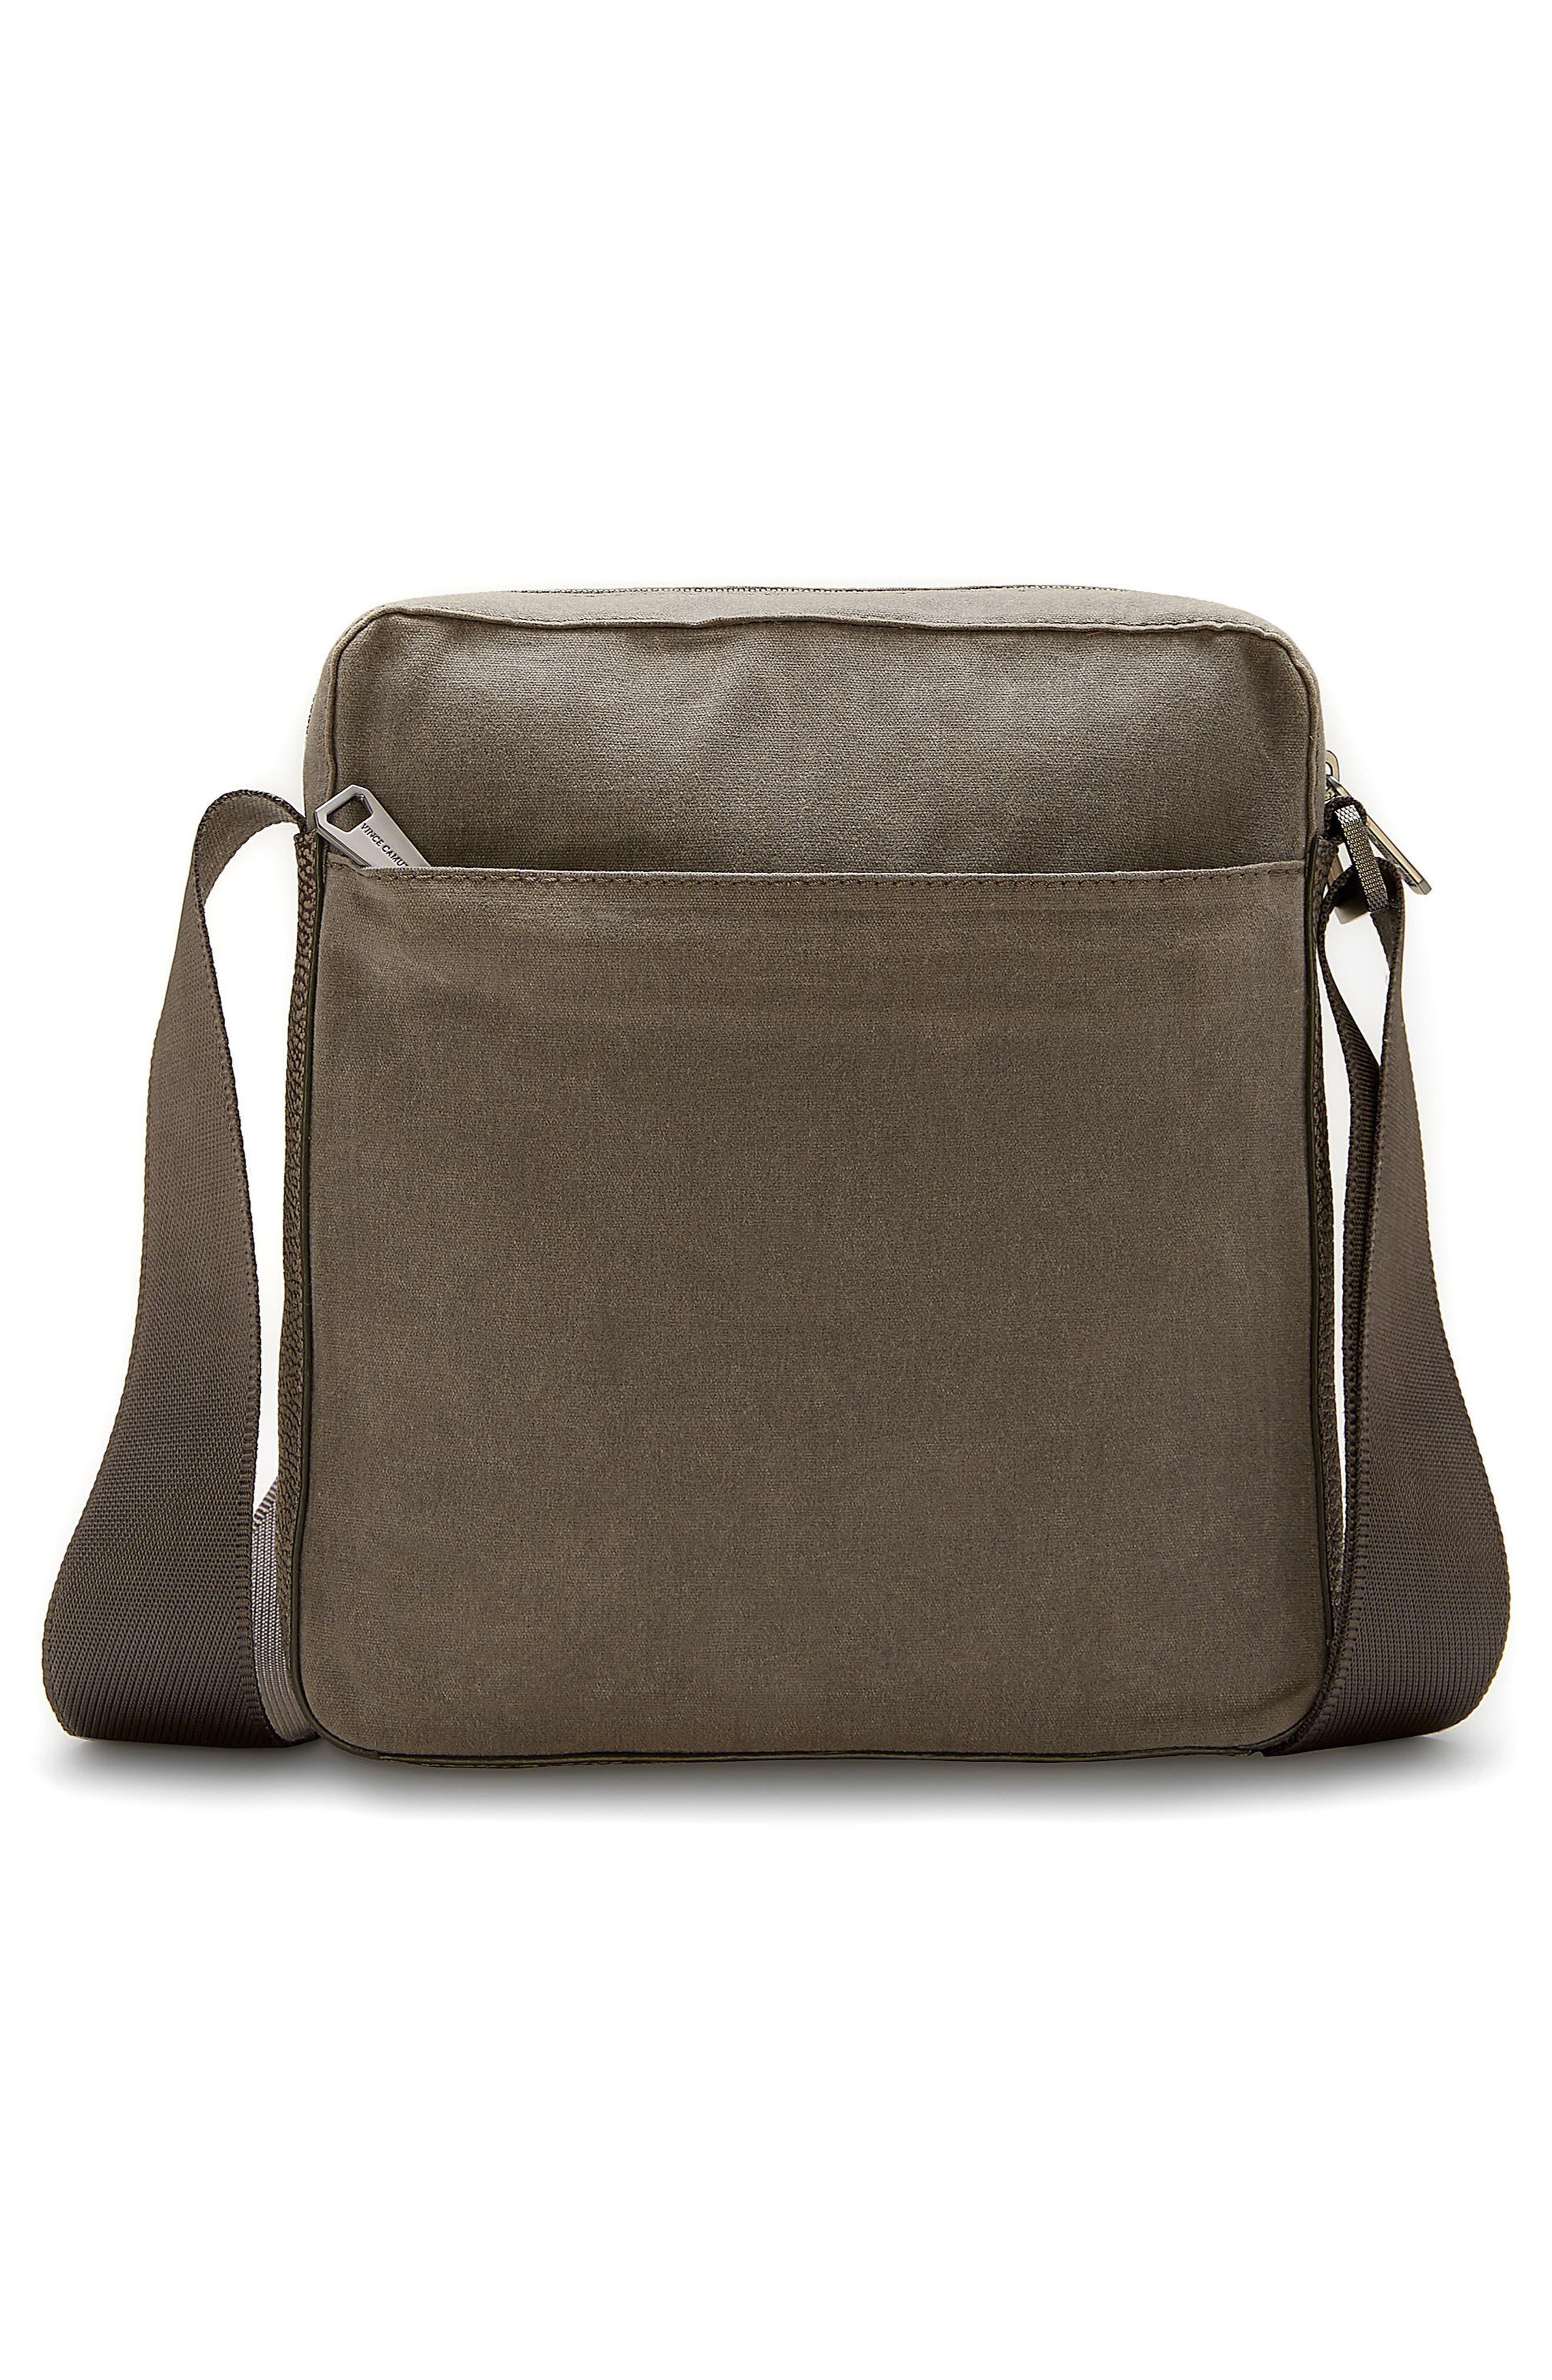 Basin Crossbody Bag,                             Alternate thumbnail 4, color,